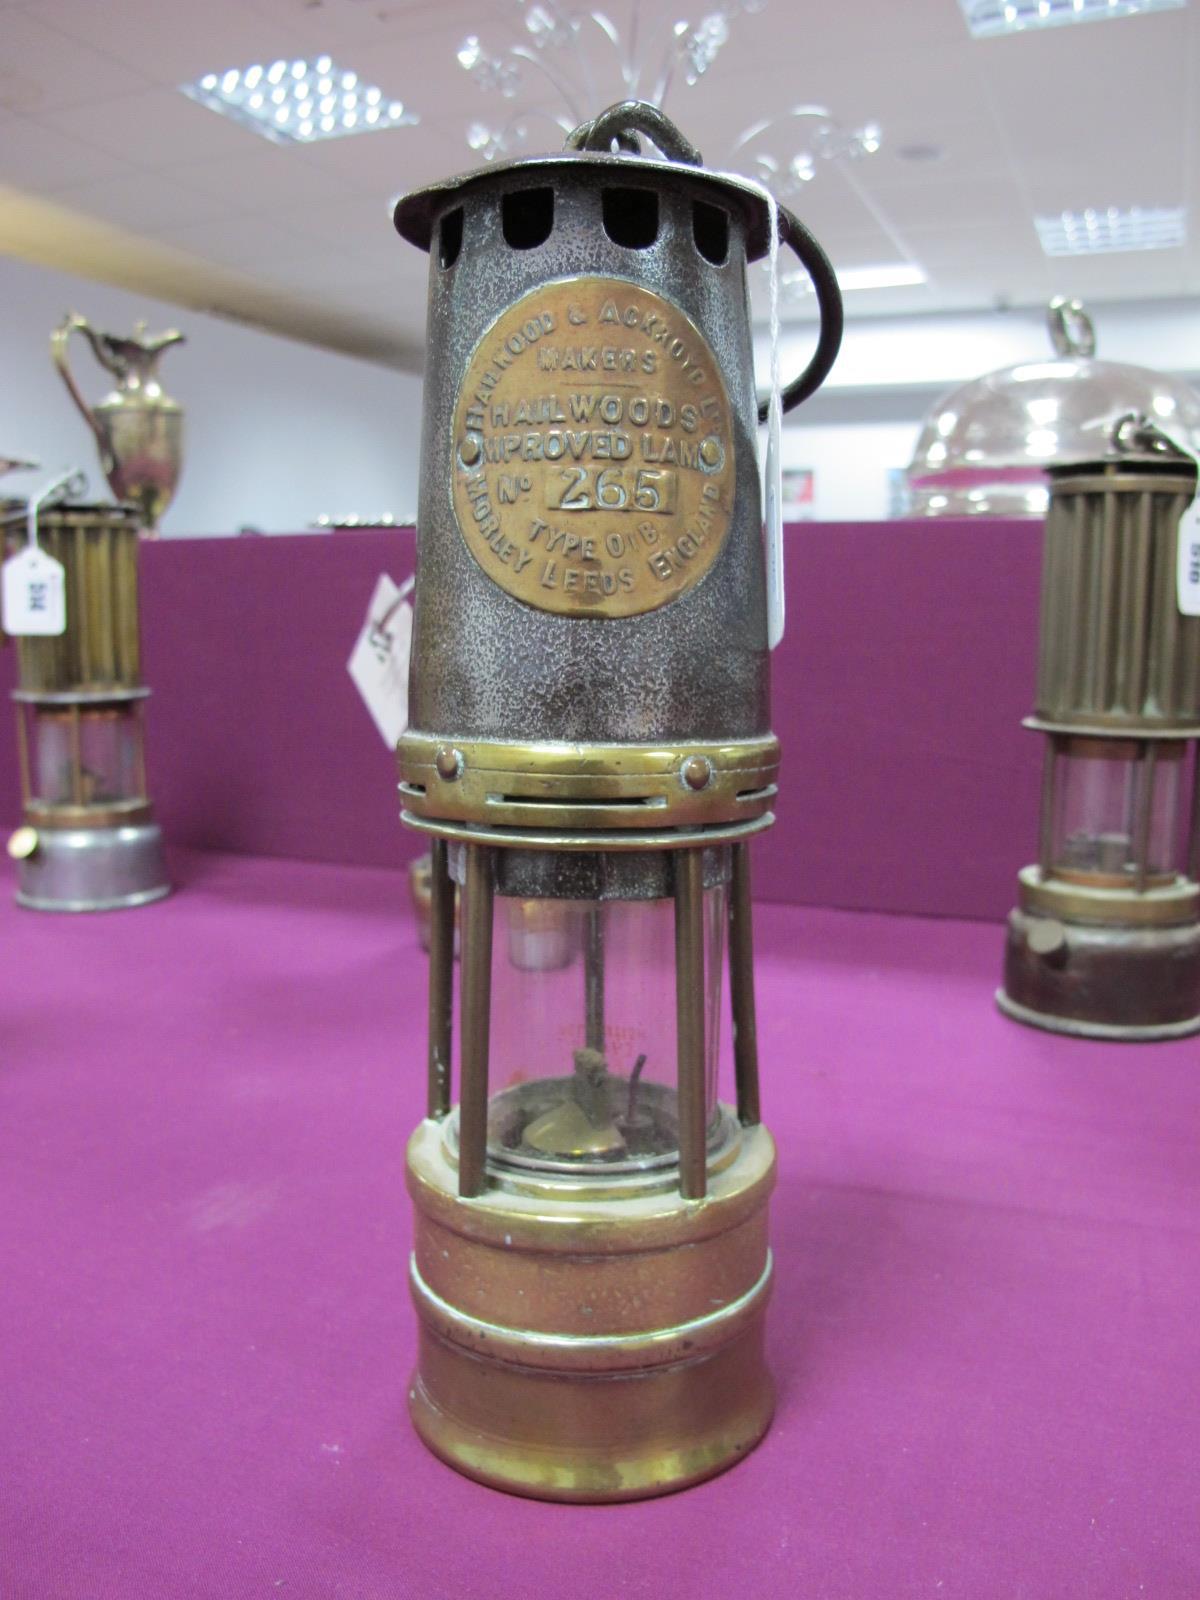 Hailwood & Ackroyd of Morley Leeds 'Type 01B' Miners Lamp, No. 265, 27cm high with suspension hook